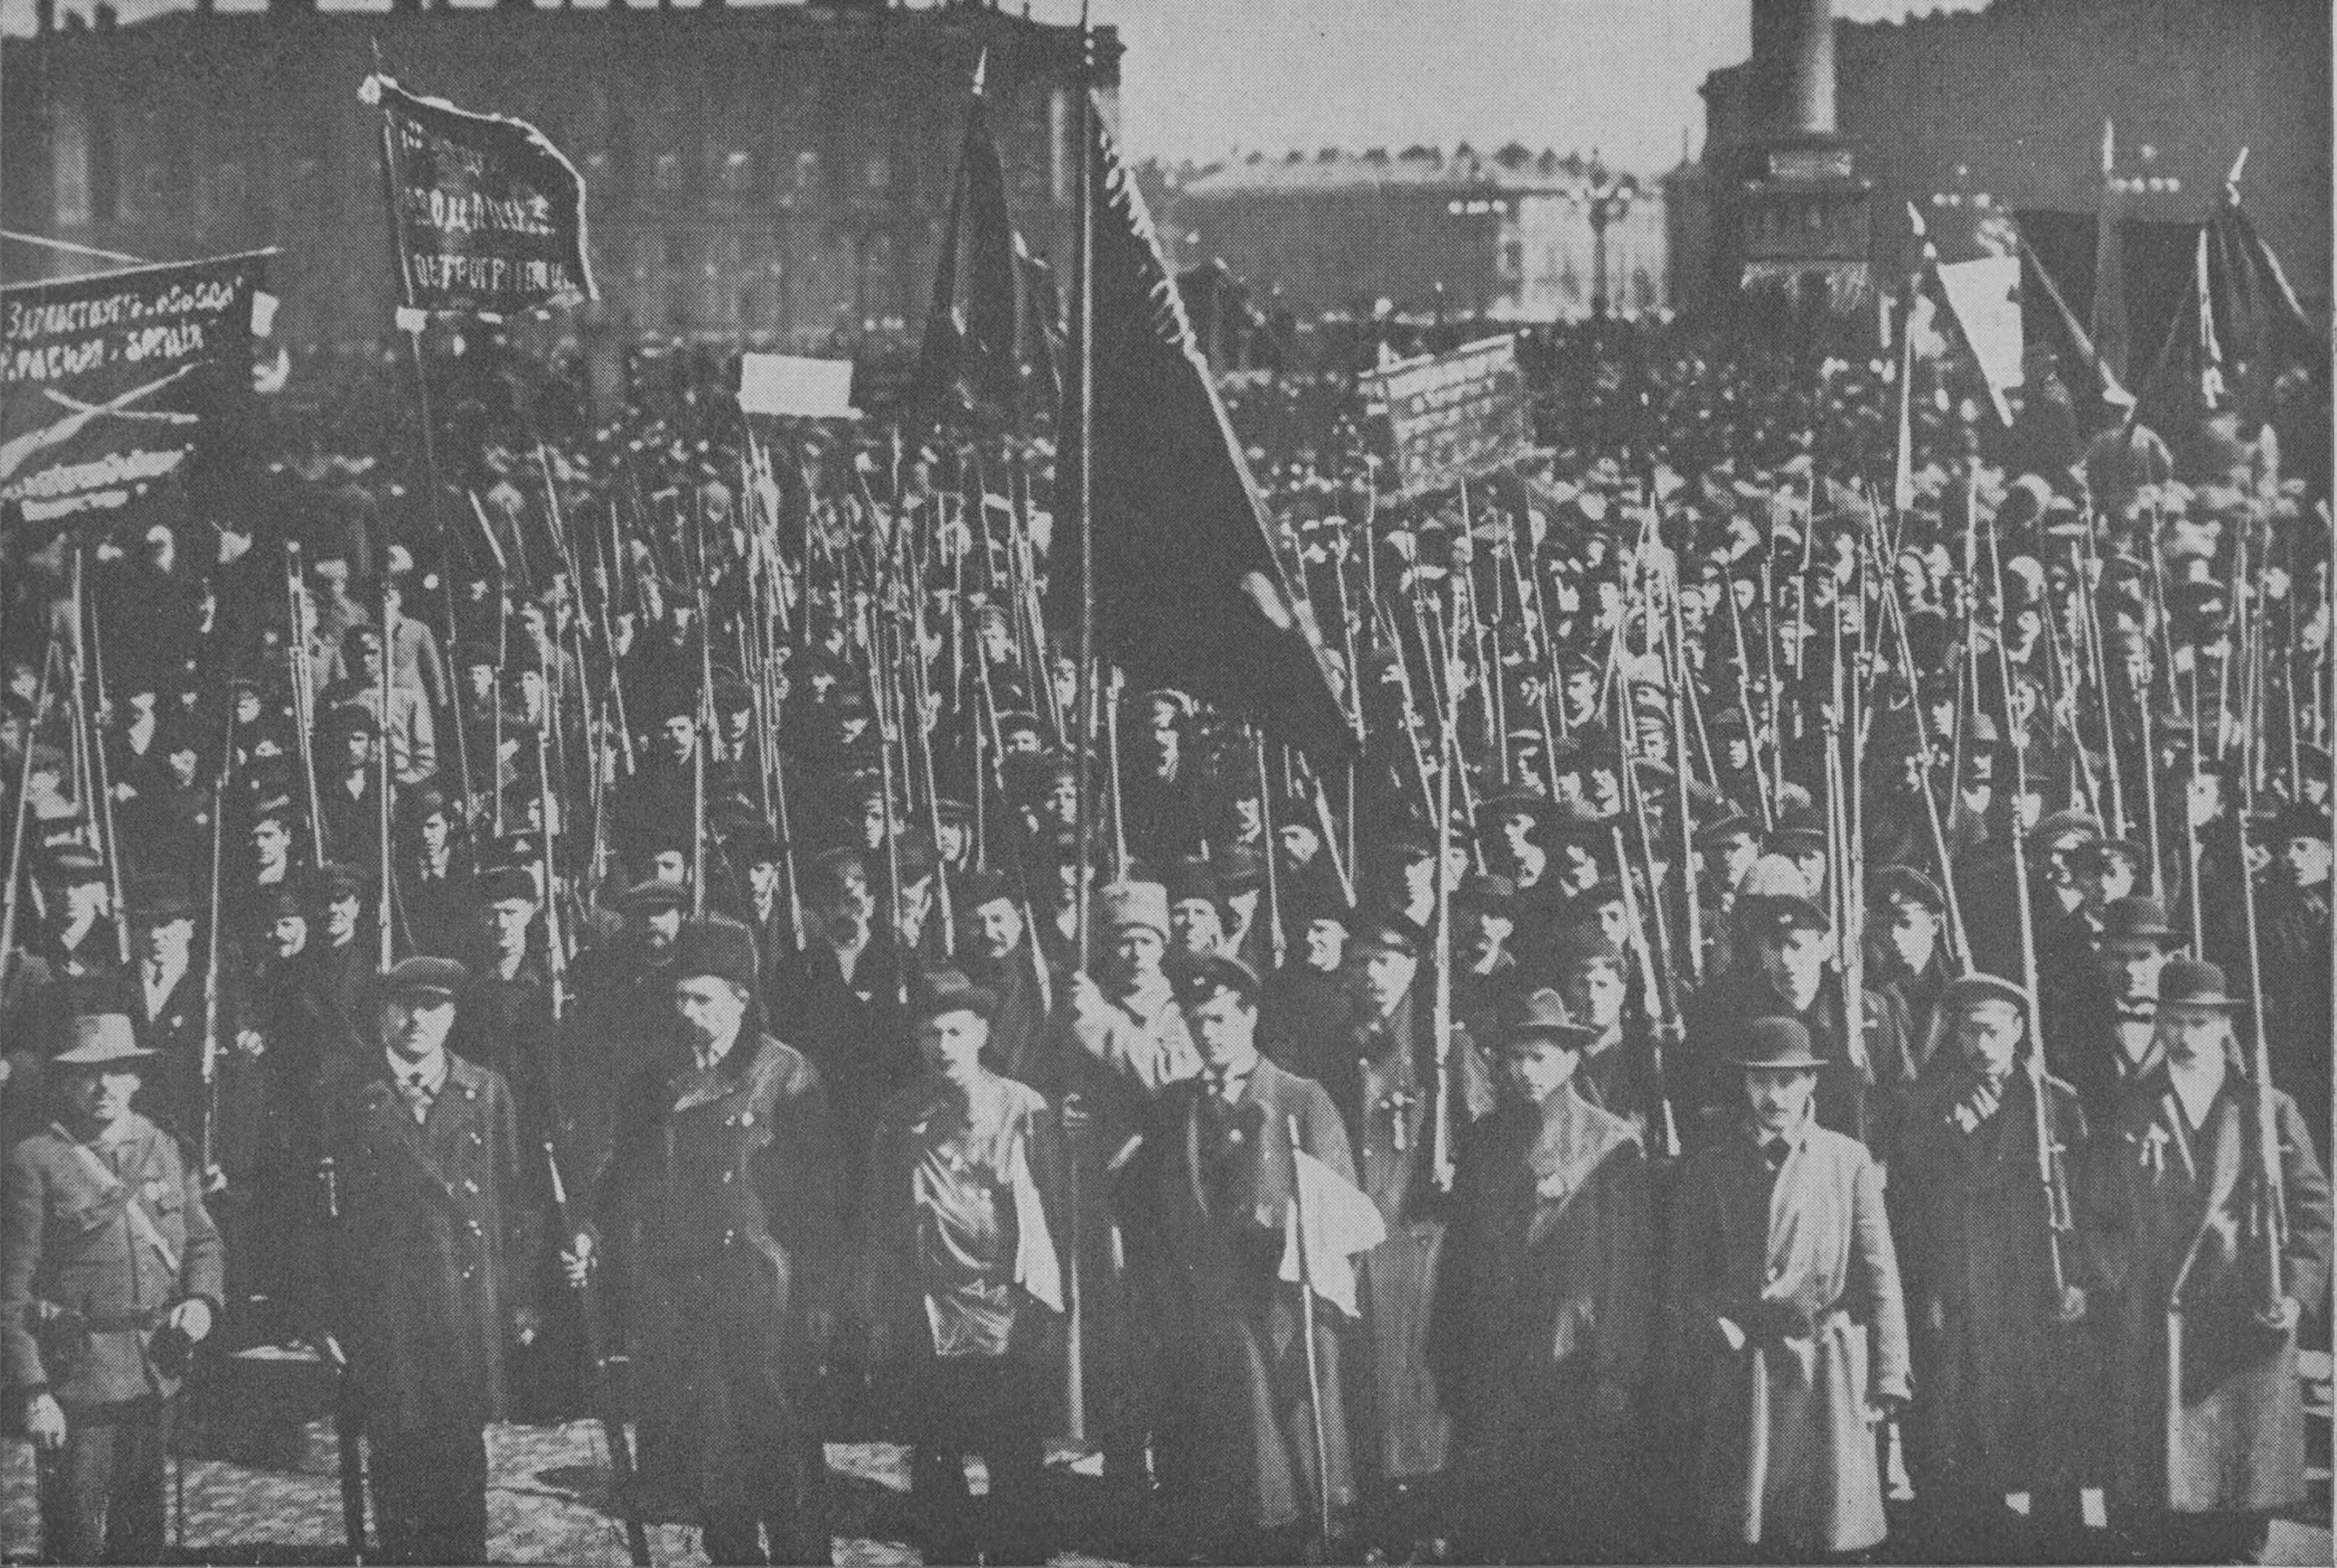 russo datazione San Pietroburgo